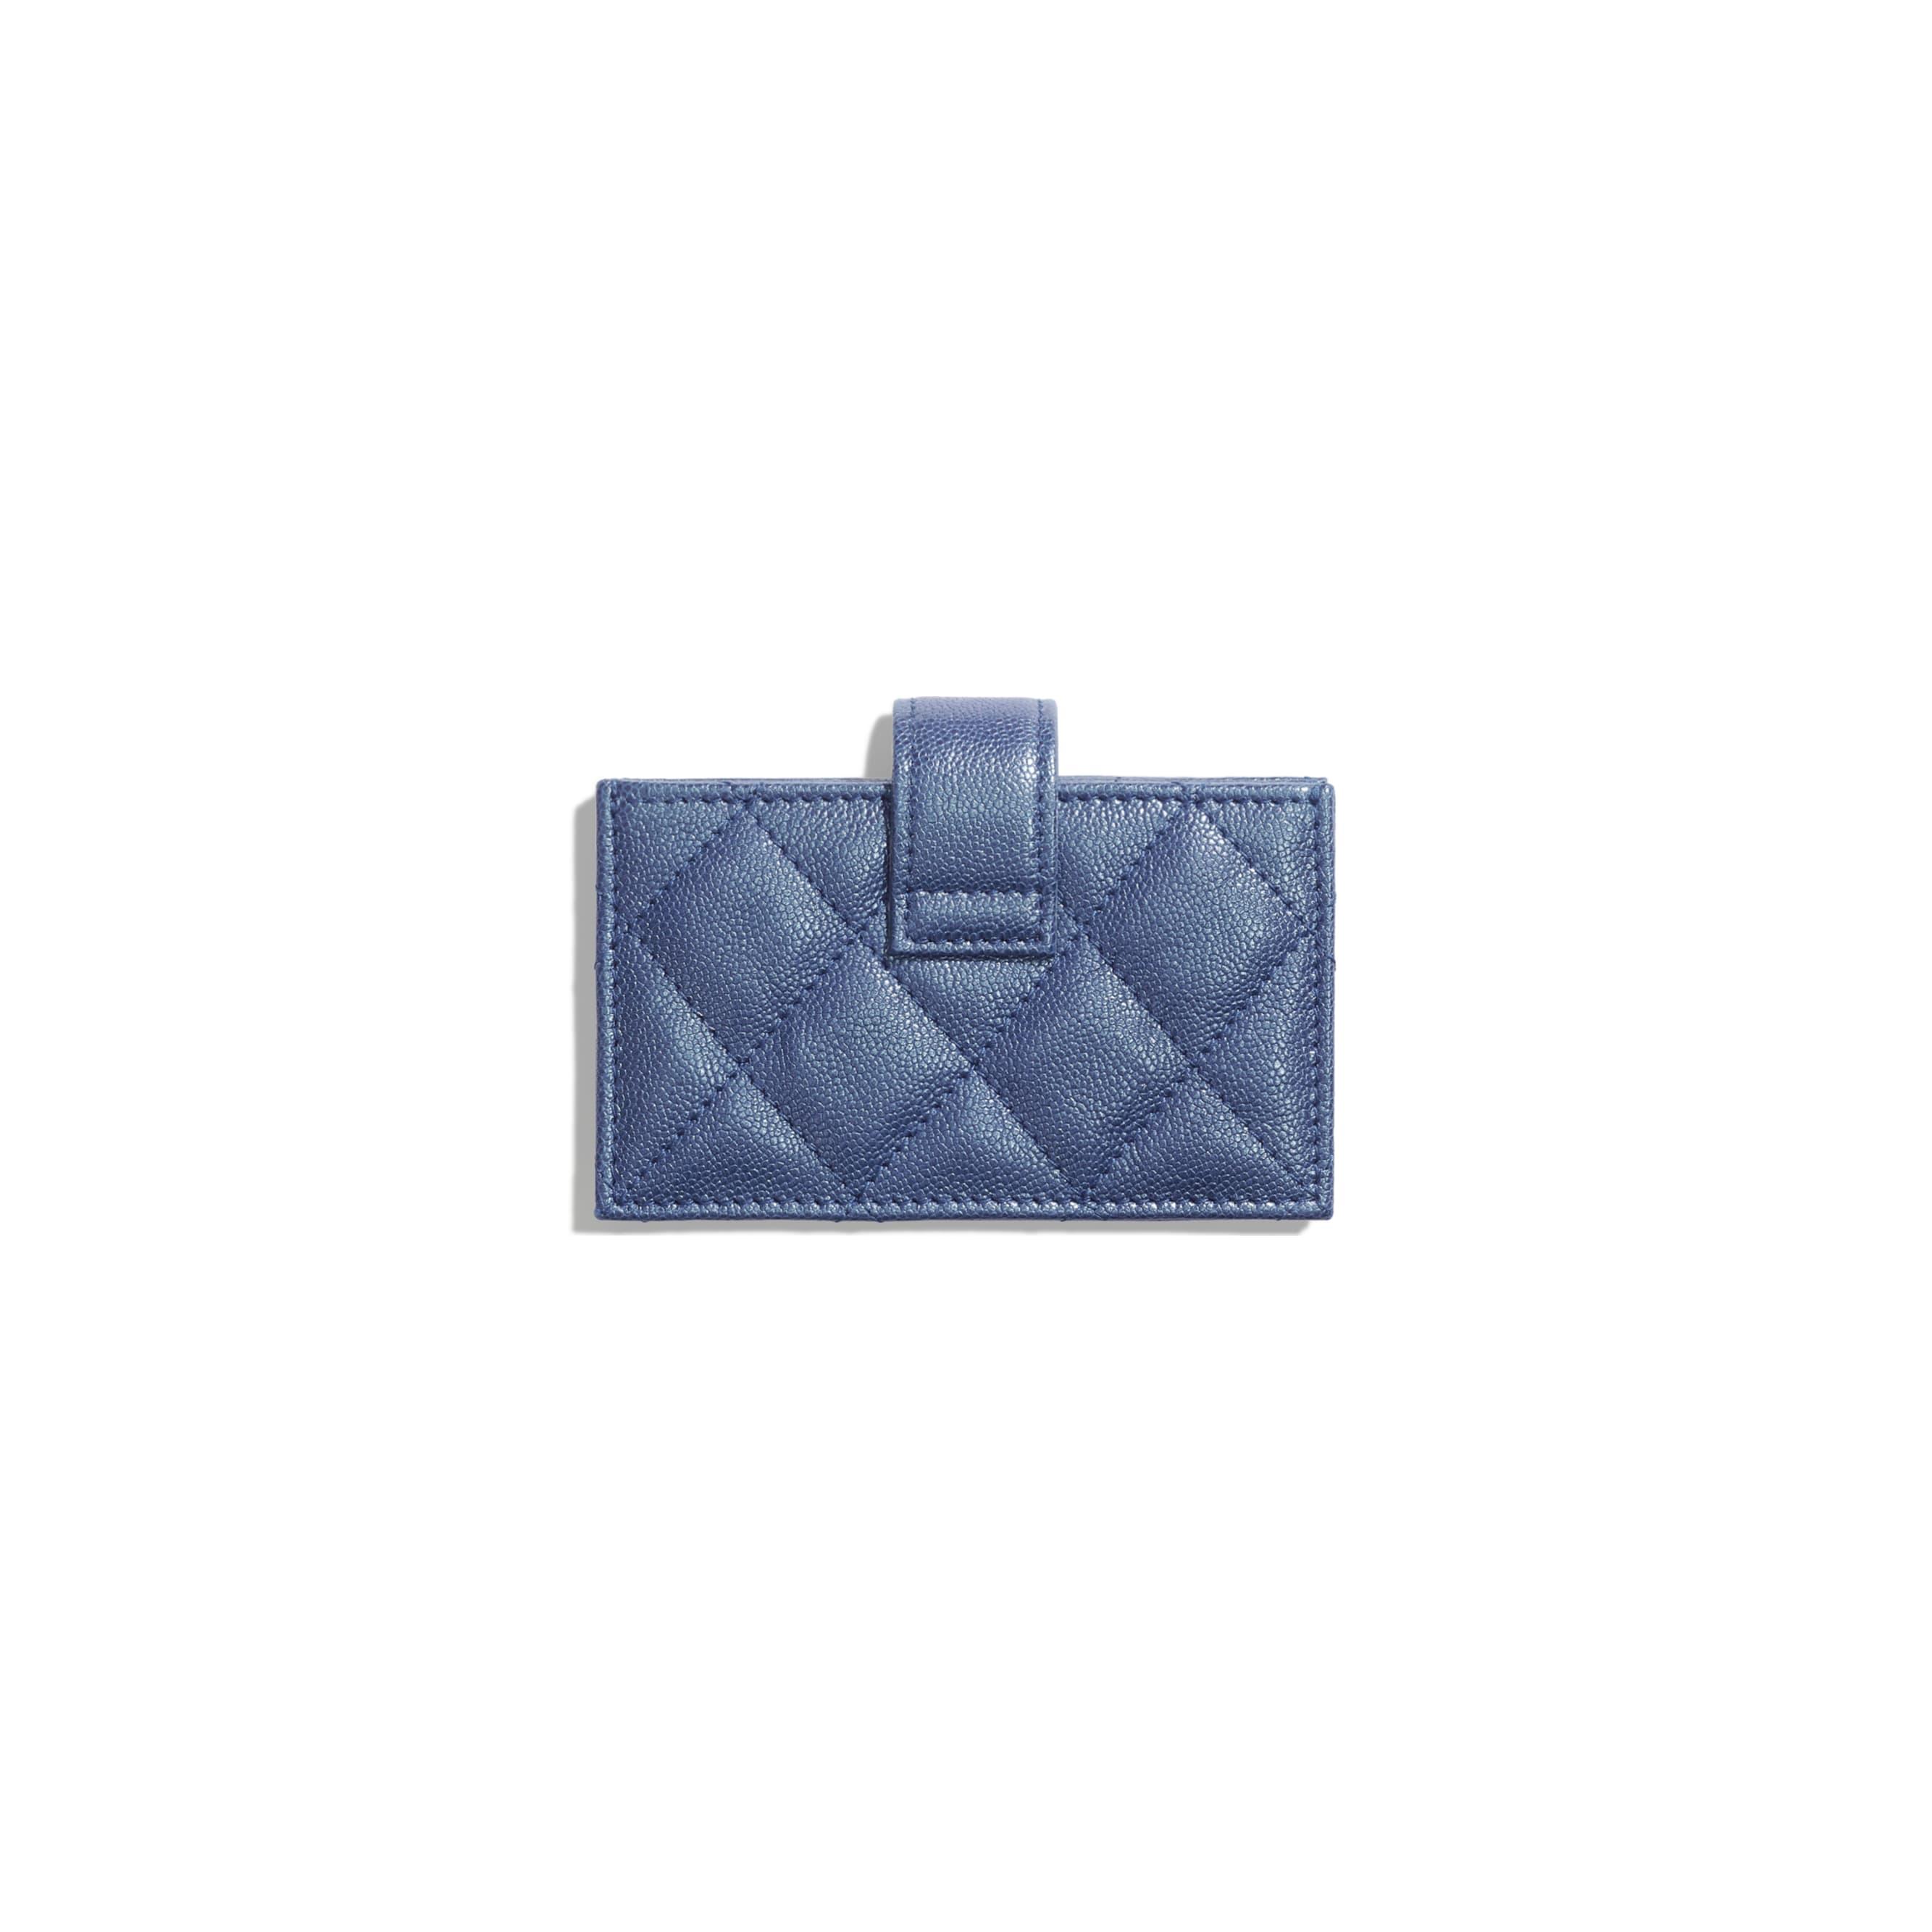 Card Holder - Dark Blue - Iridescent Grained Calfskin & Gold-Tone Metal - Alternative view - see standard sized version